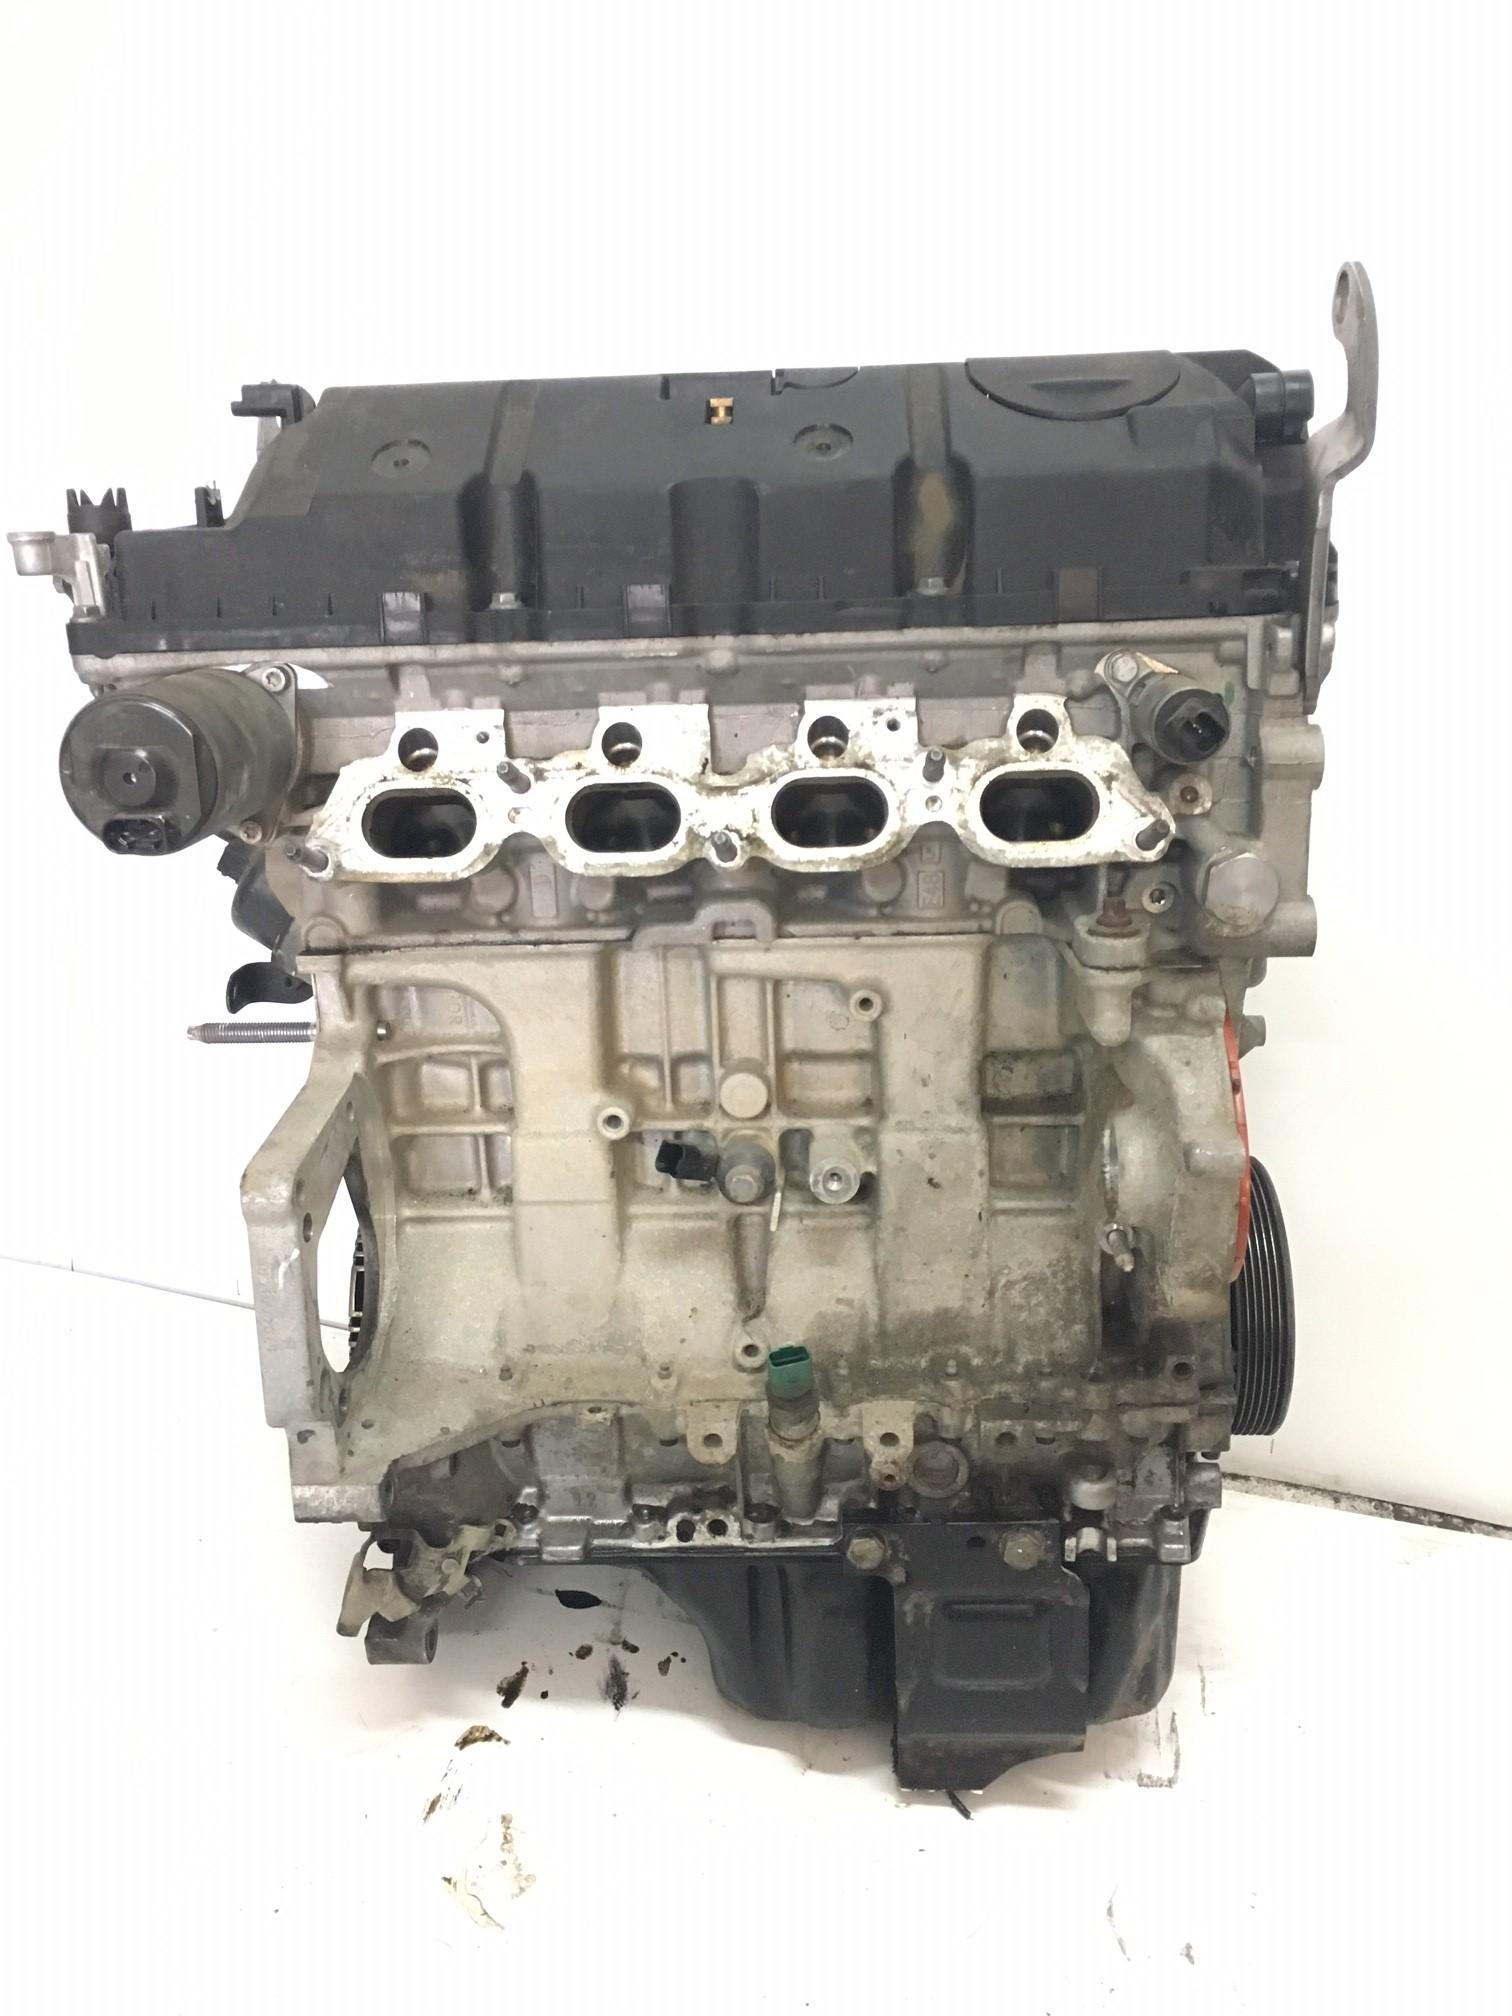 Motor 1,6 VTI 5FW EP6 na Citroen C3 C4 C5 Berlingo Picasso Peugeot Partner 207 208 308 3008 508 5008